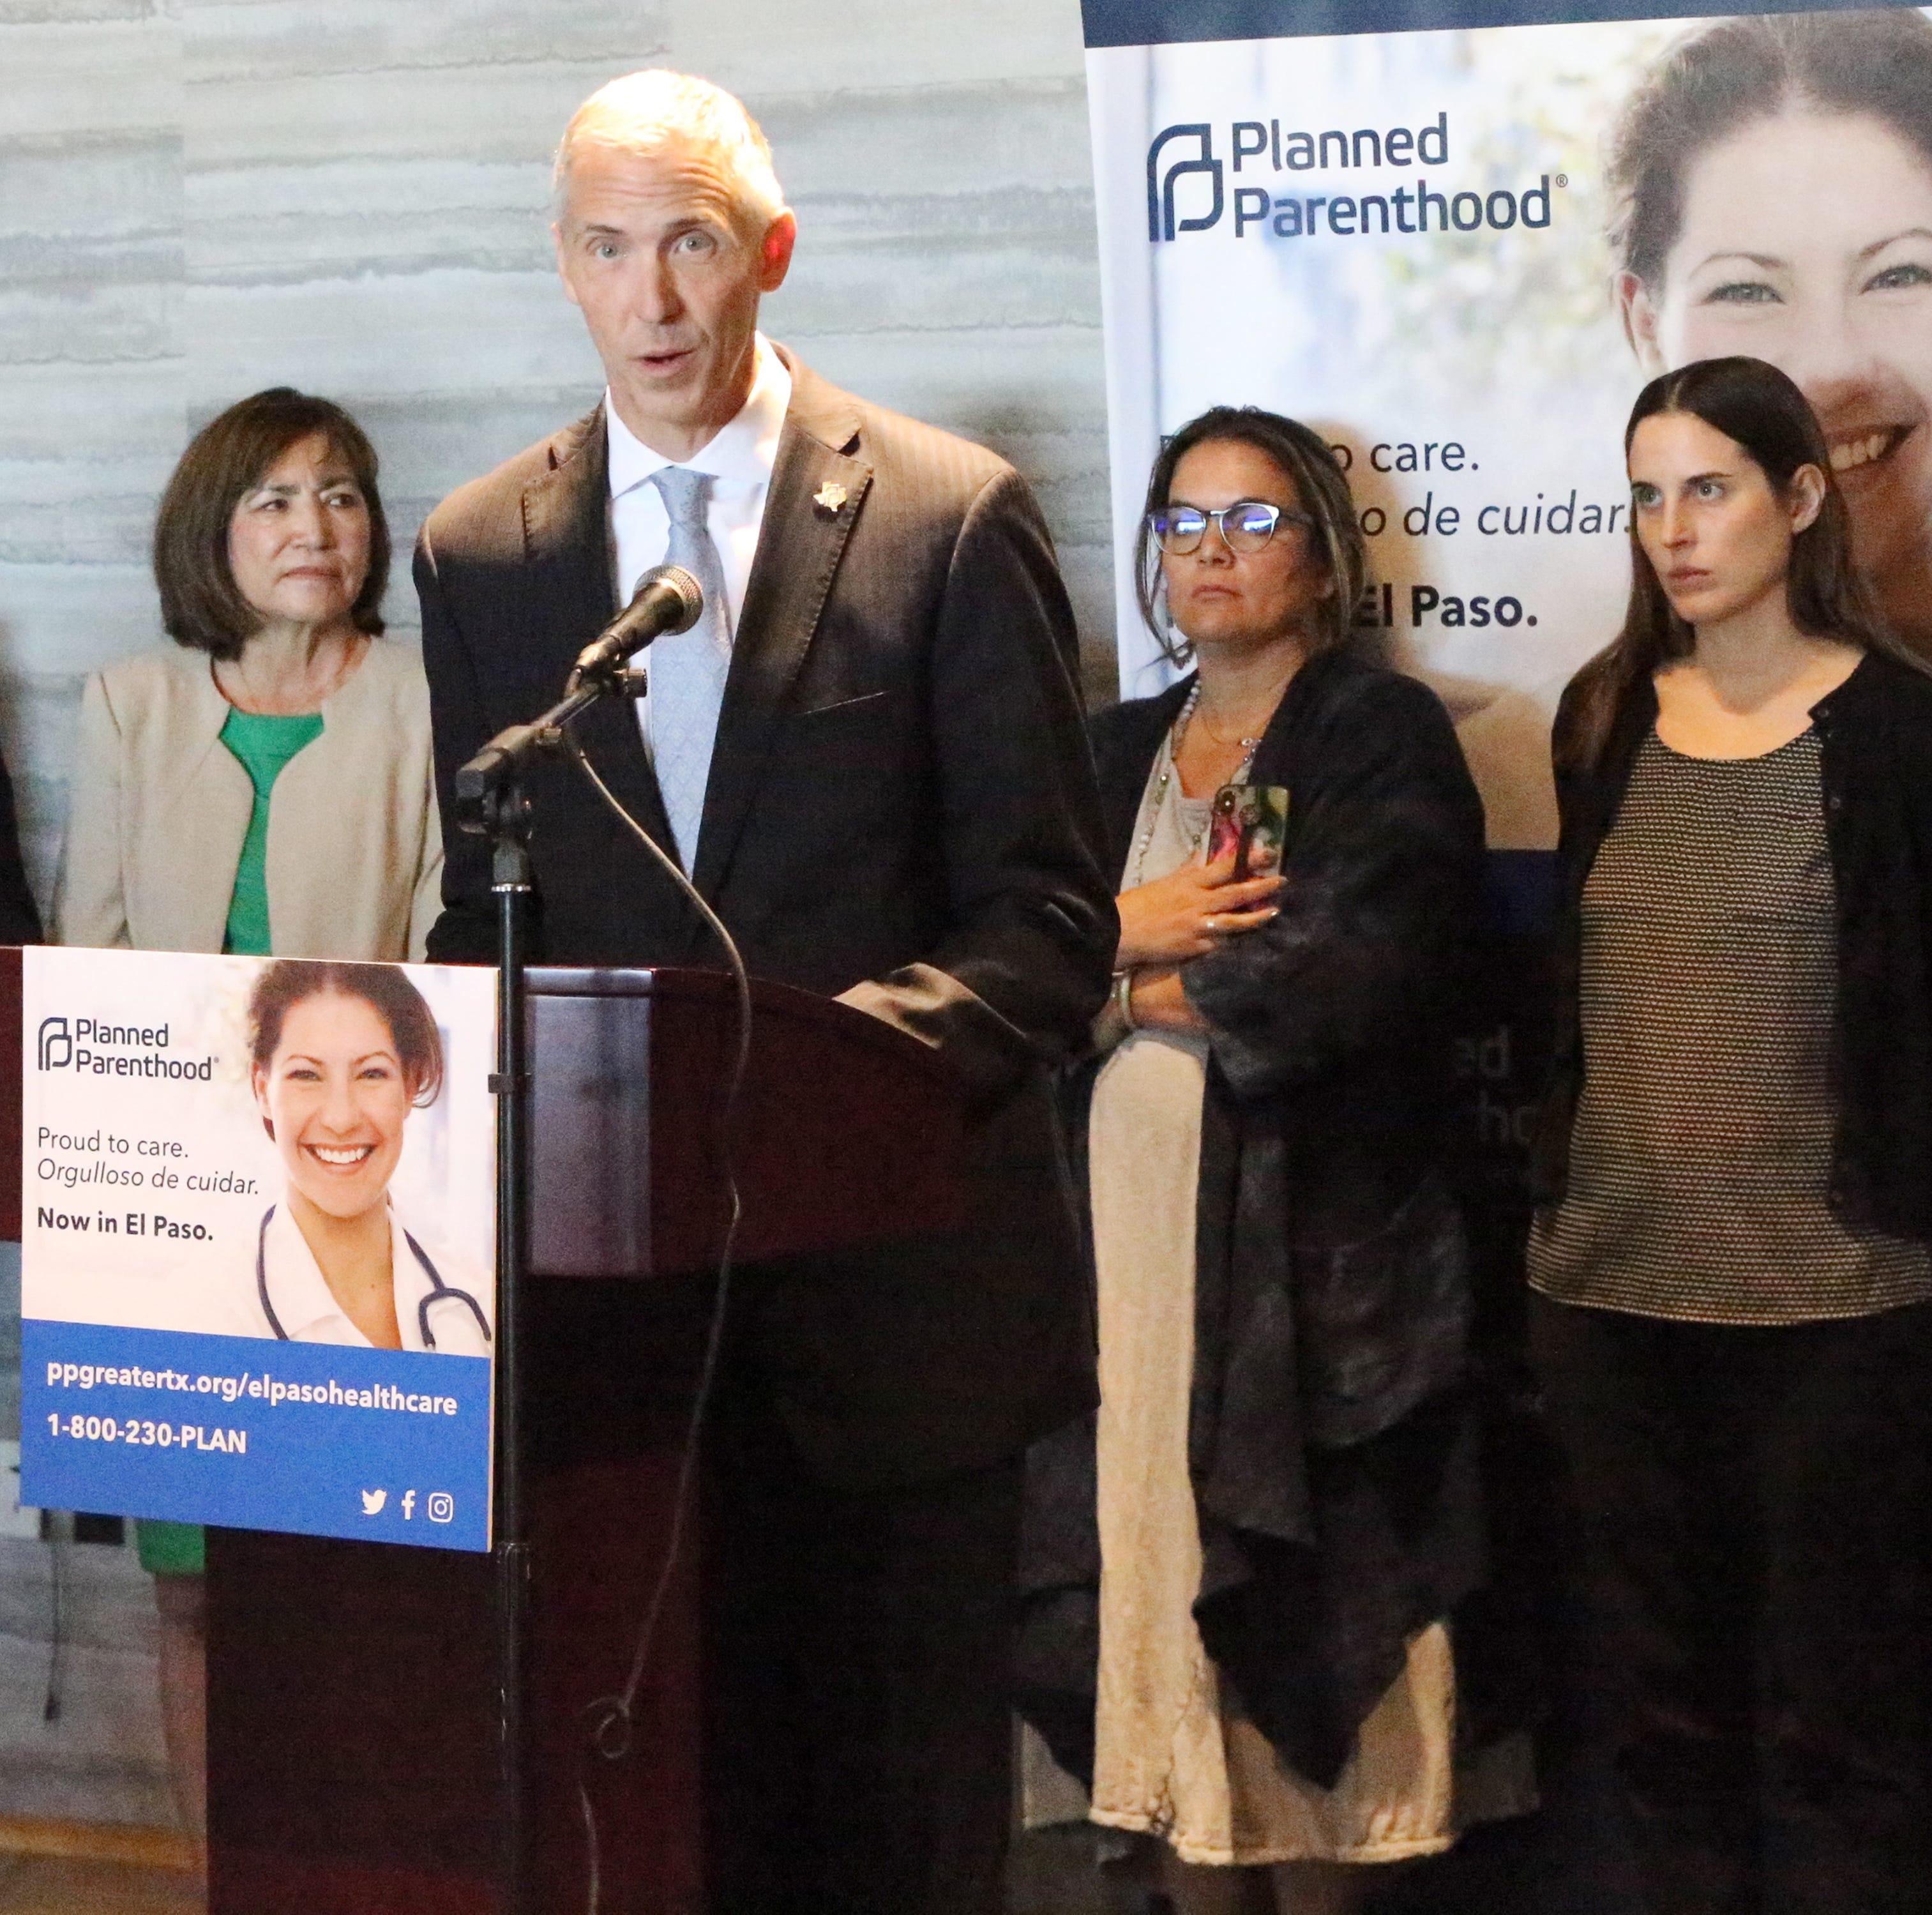 Protect health care in El Paso by opposing SB 22: Dr. Kristyn Ingram